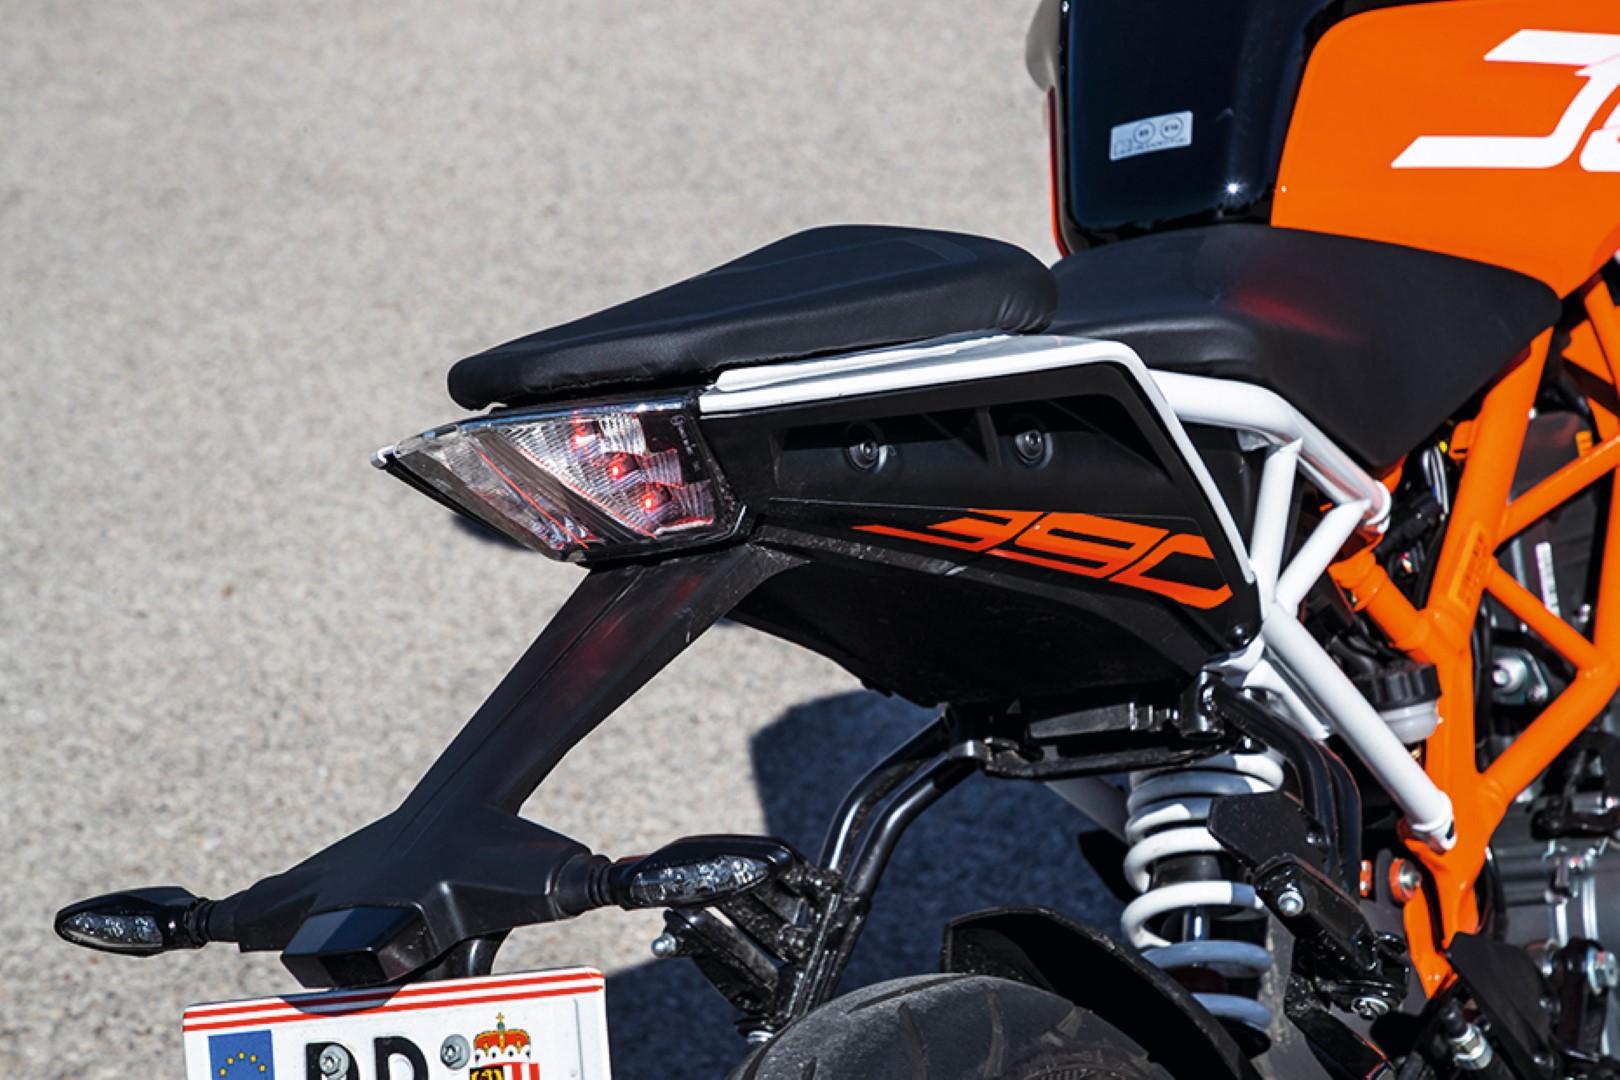 Comparativa Naked A2: Honda CB500F, Kawasaki Z400, KTM 390 Duke, Yamaha MT-03